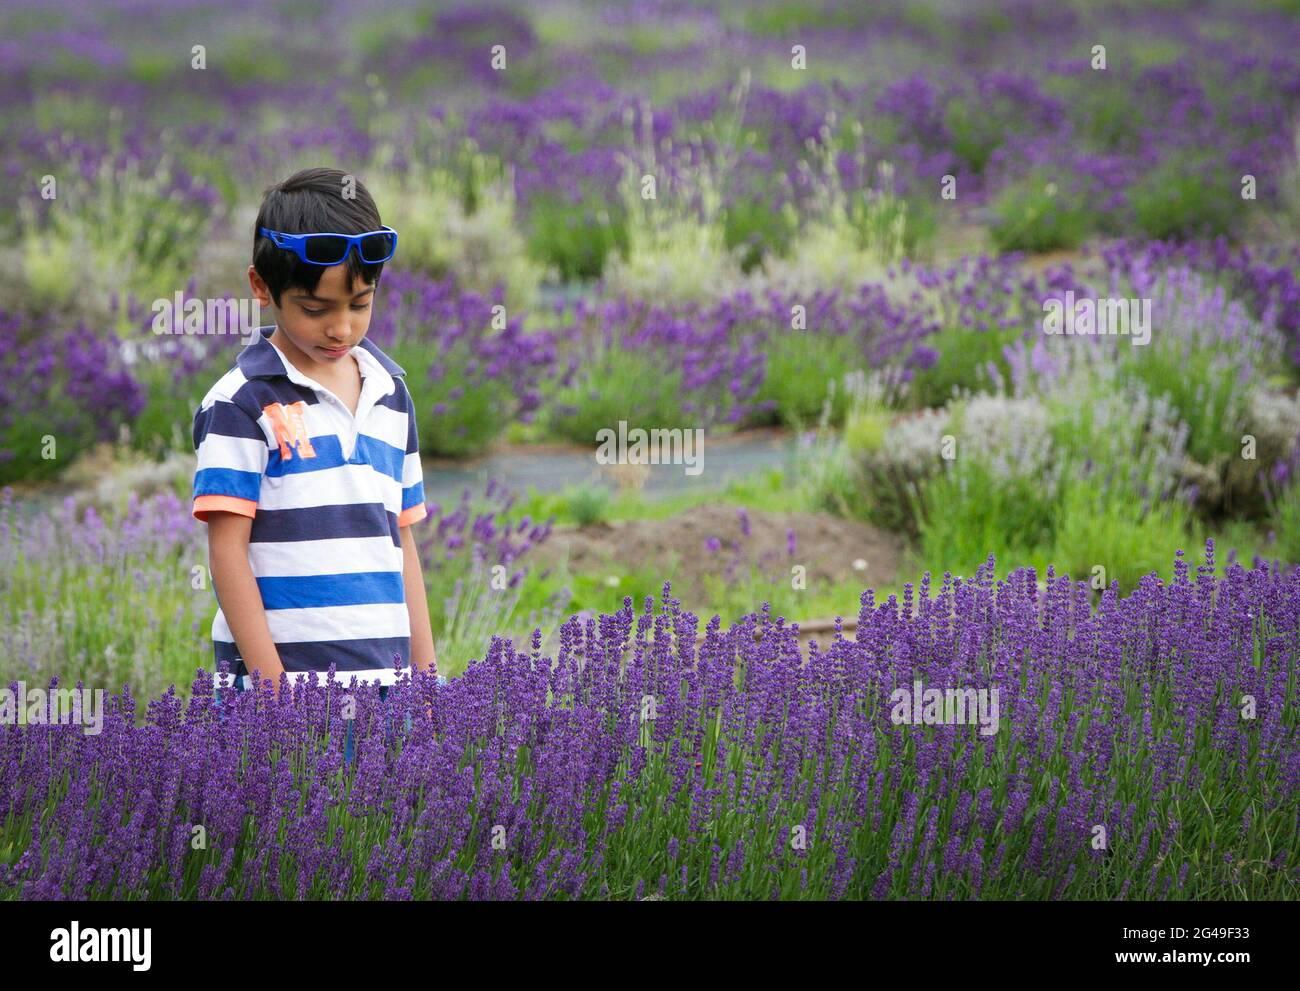 Richmond, Canada. 19th June, 2021. A child visits a lavender farm in Richmond, British Columbia, Canada, June 19, 2021. Credit: Liang Sen/Xinhua/Alamy Live News Stock Photo